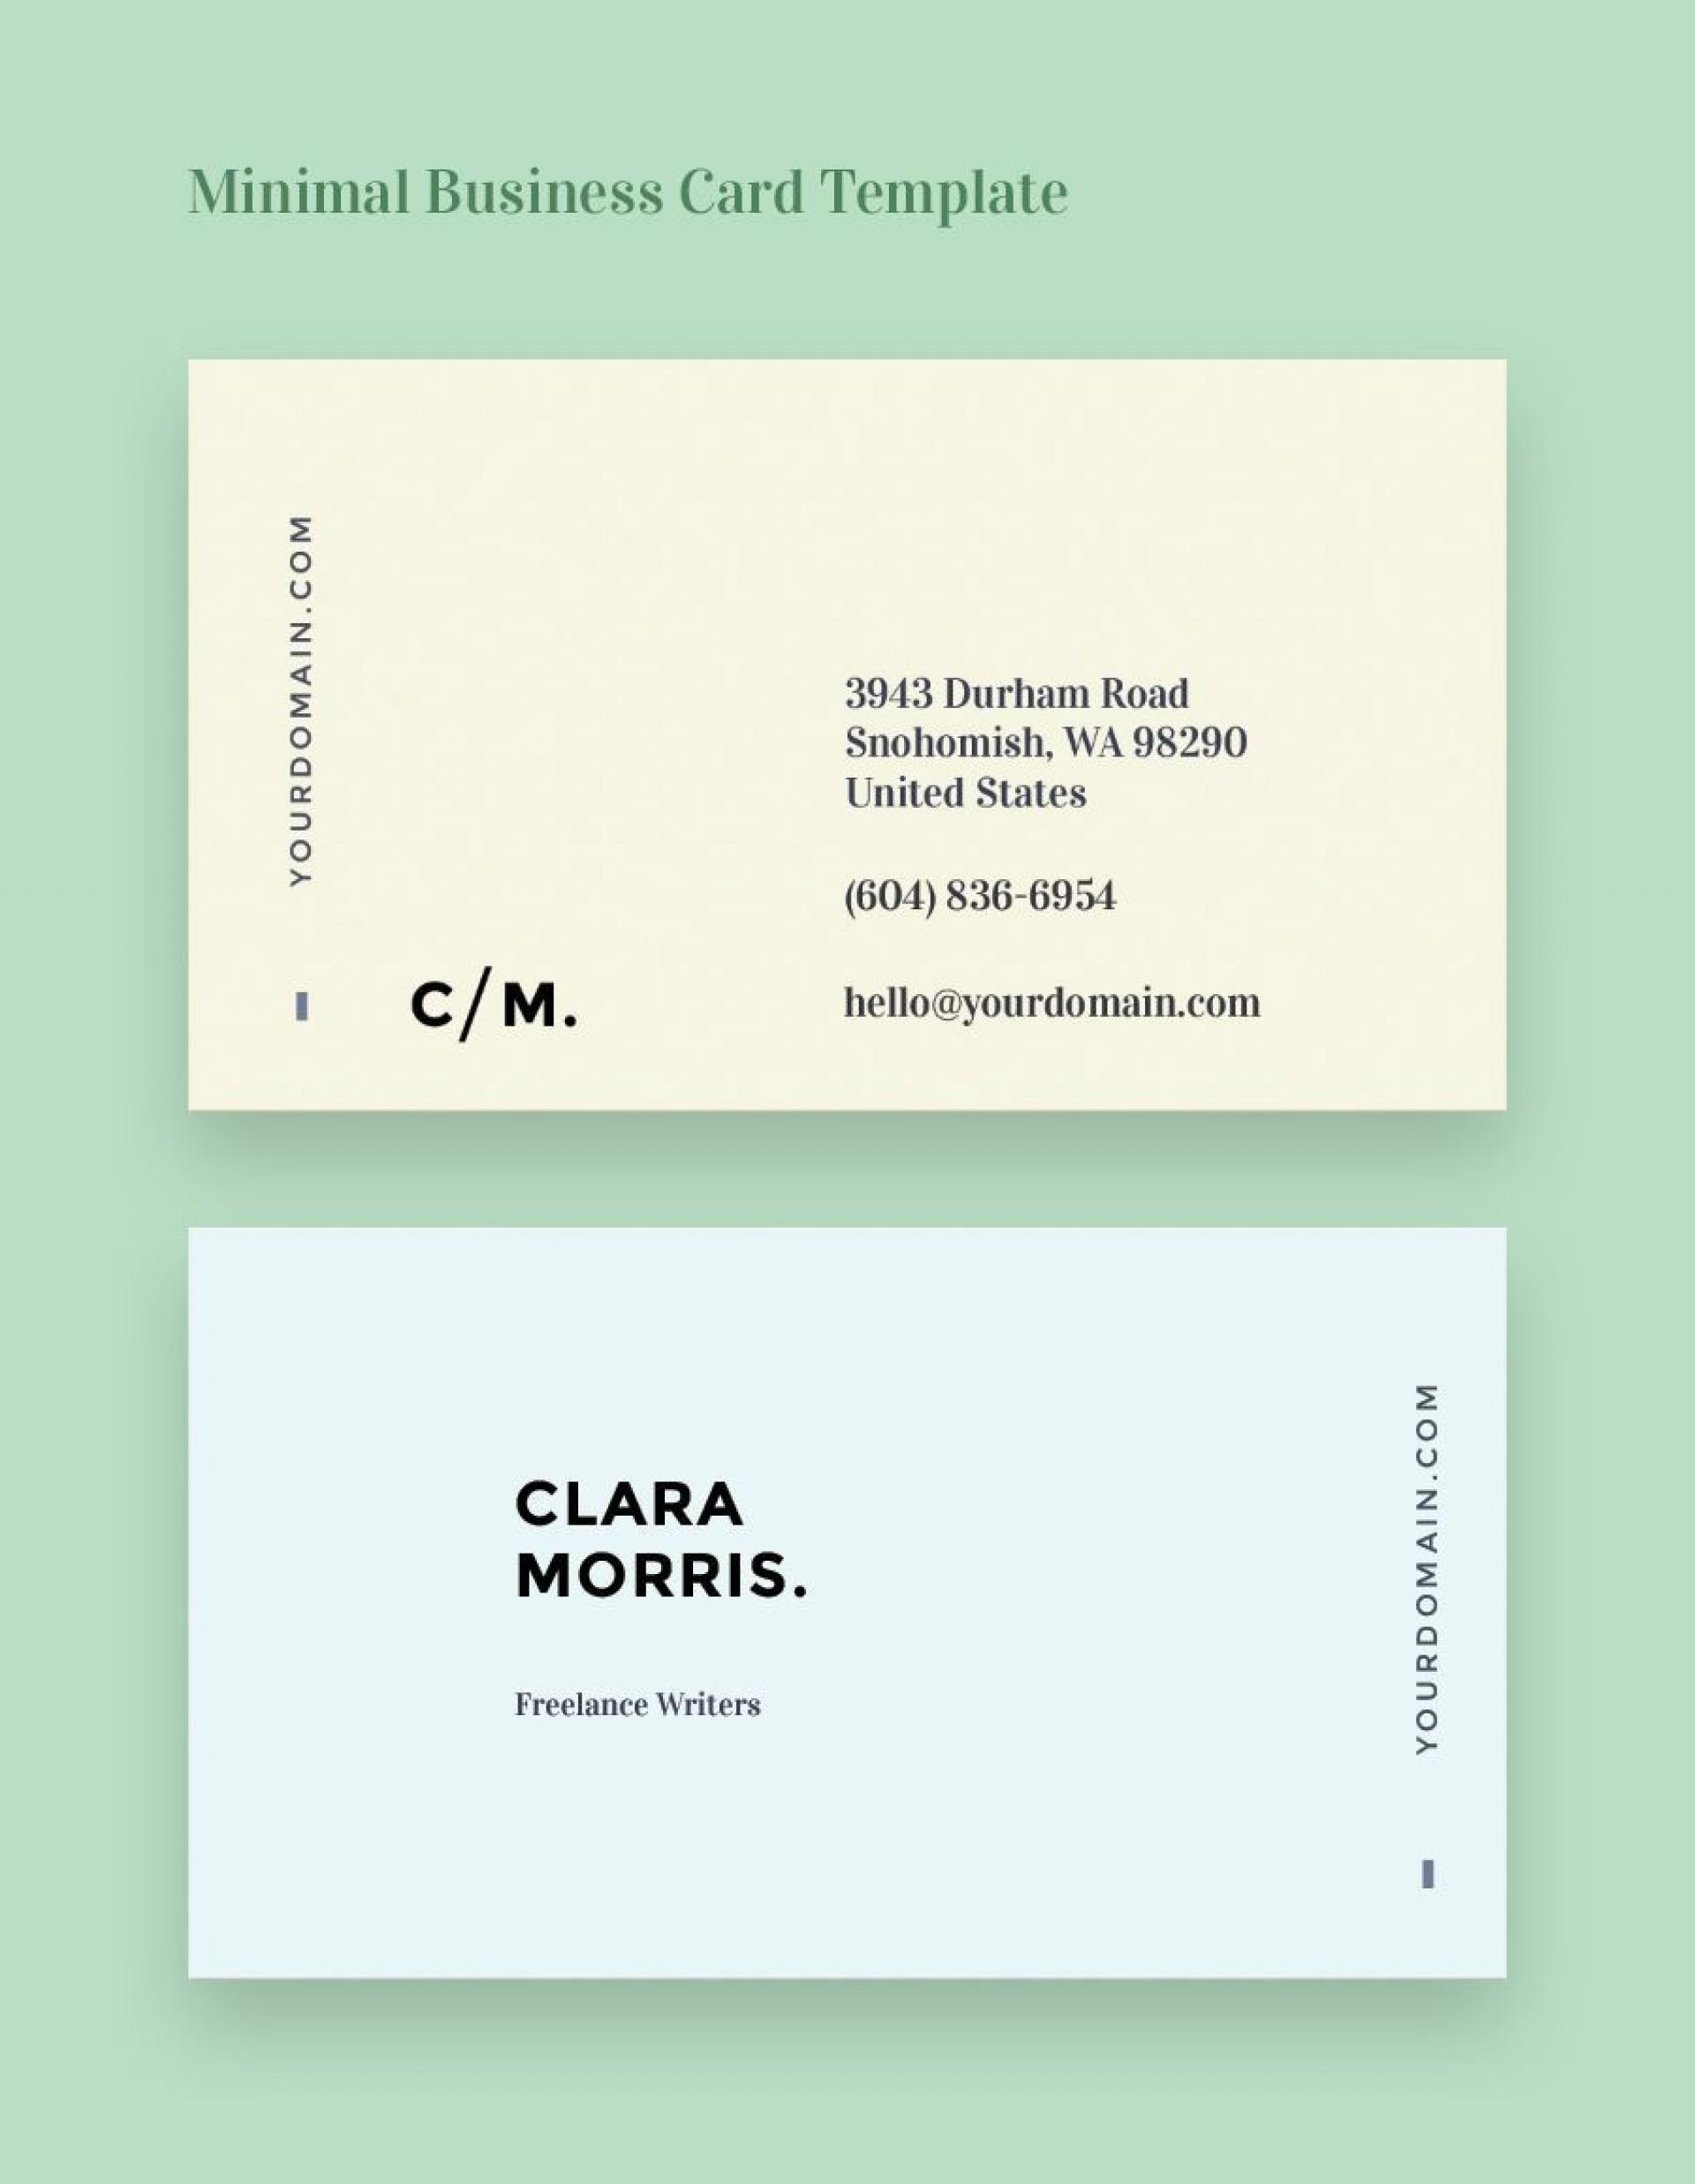 002 Unusual Minimal Busines Card Template Free Idea  Easy Simple Download1920